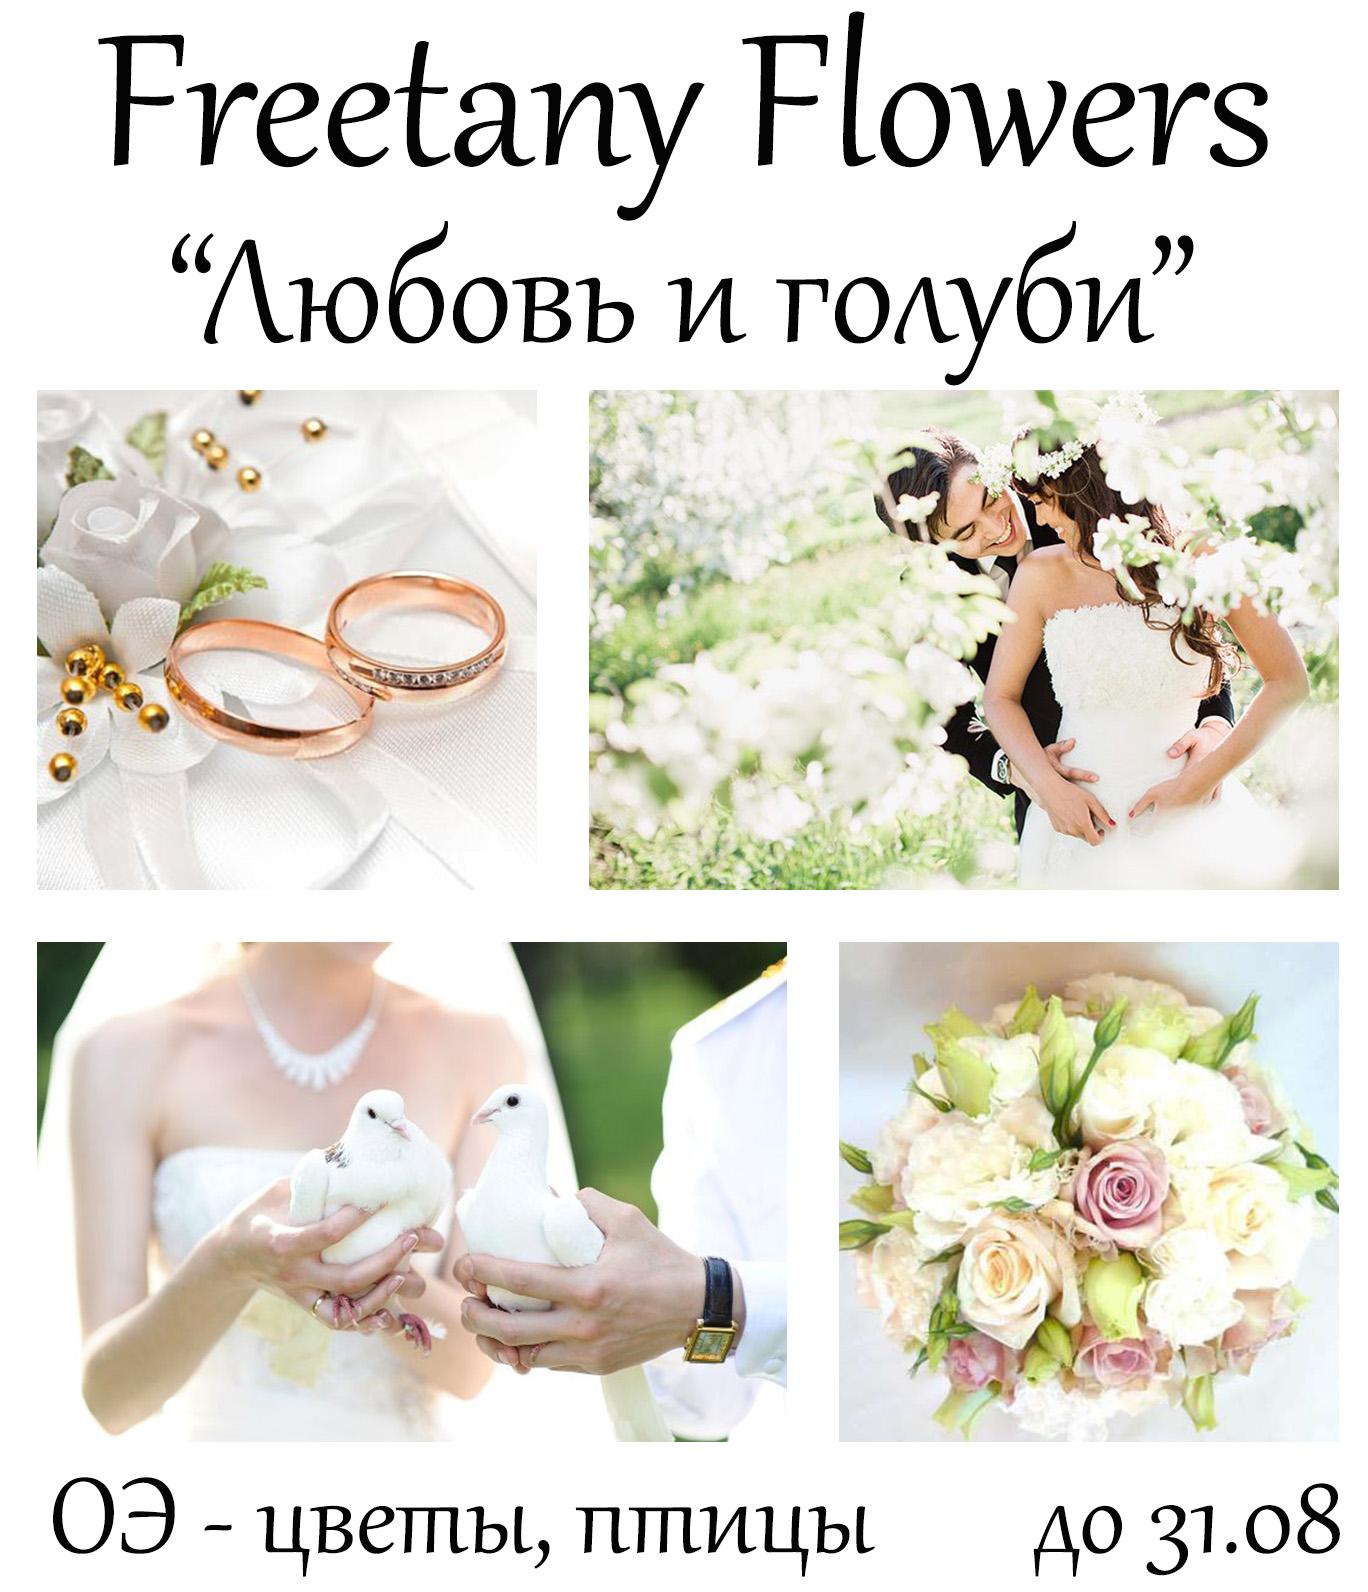 "Freetany Flowers: Задание августа ""Любовь и голуби"""